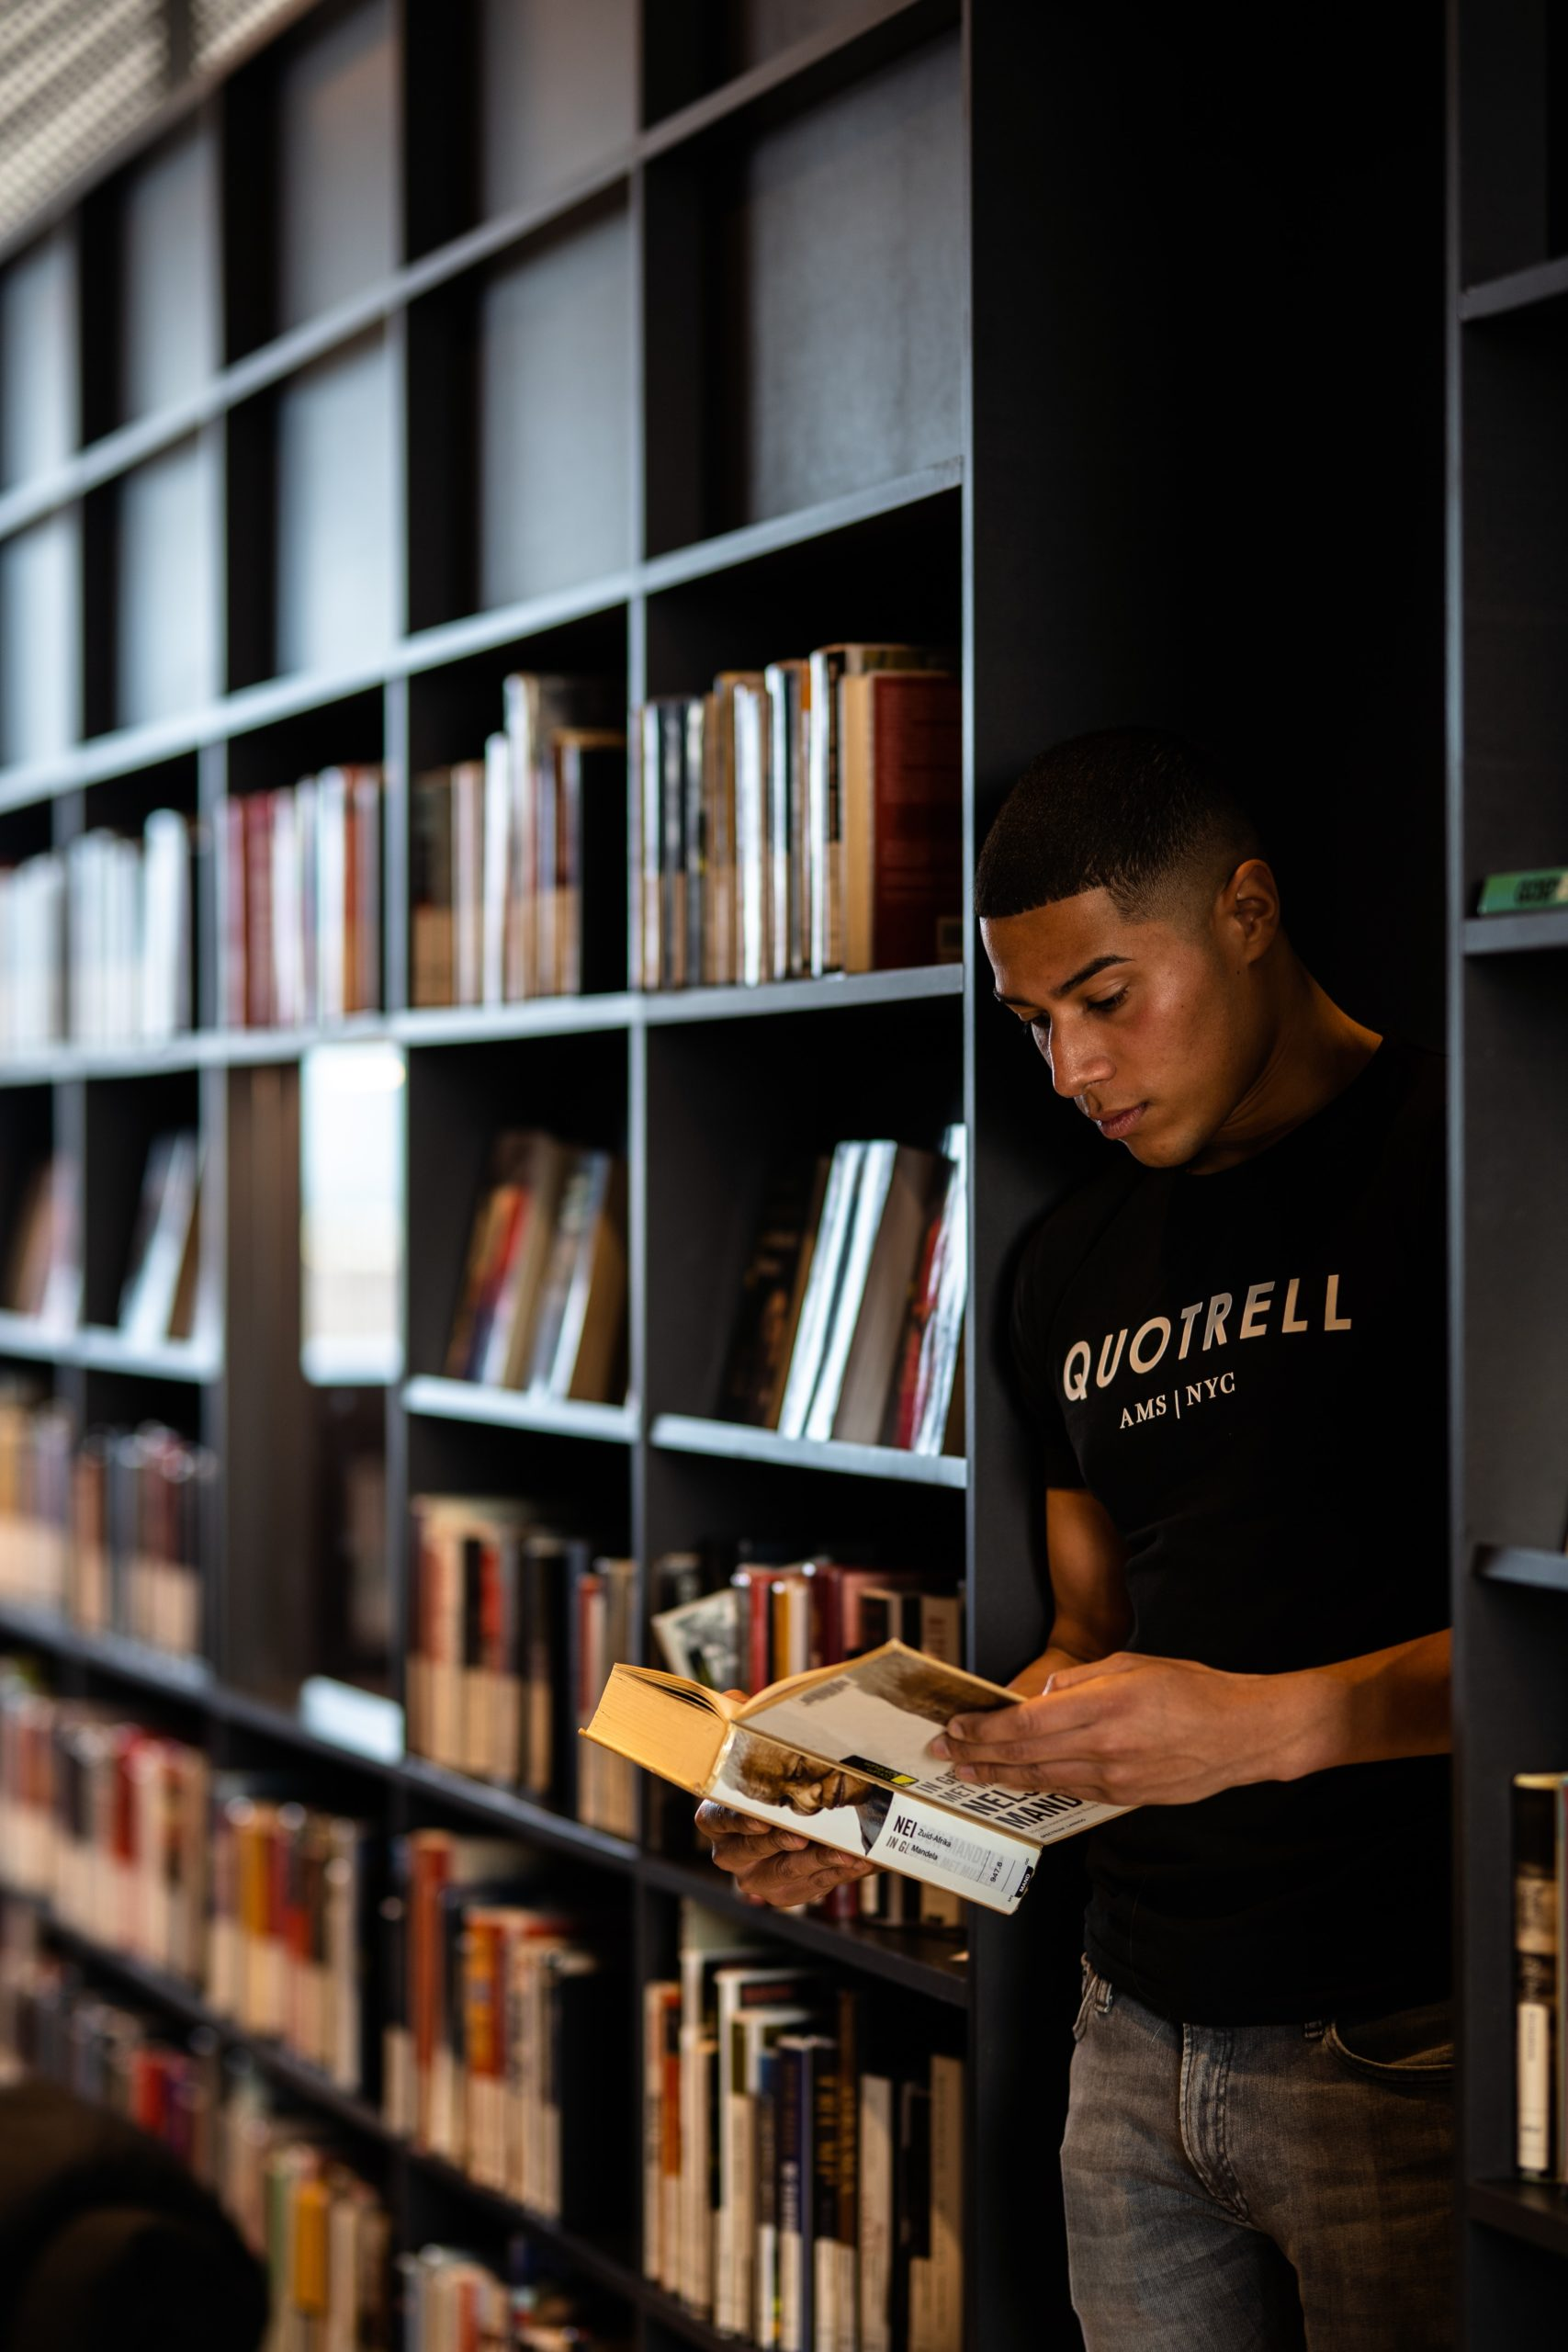 Recherche en bibliothèque